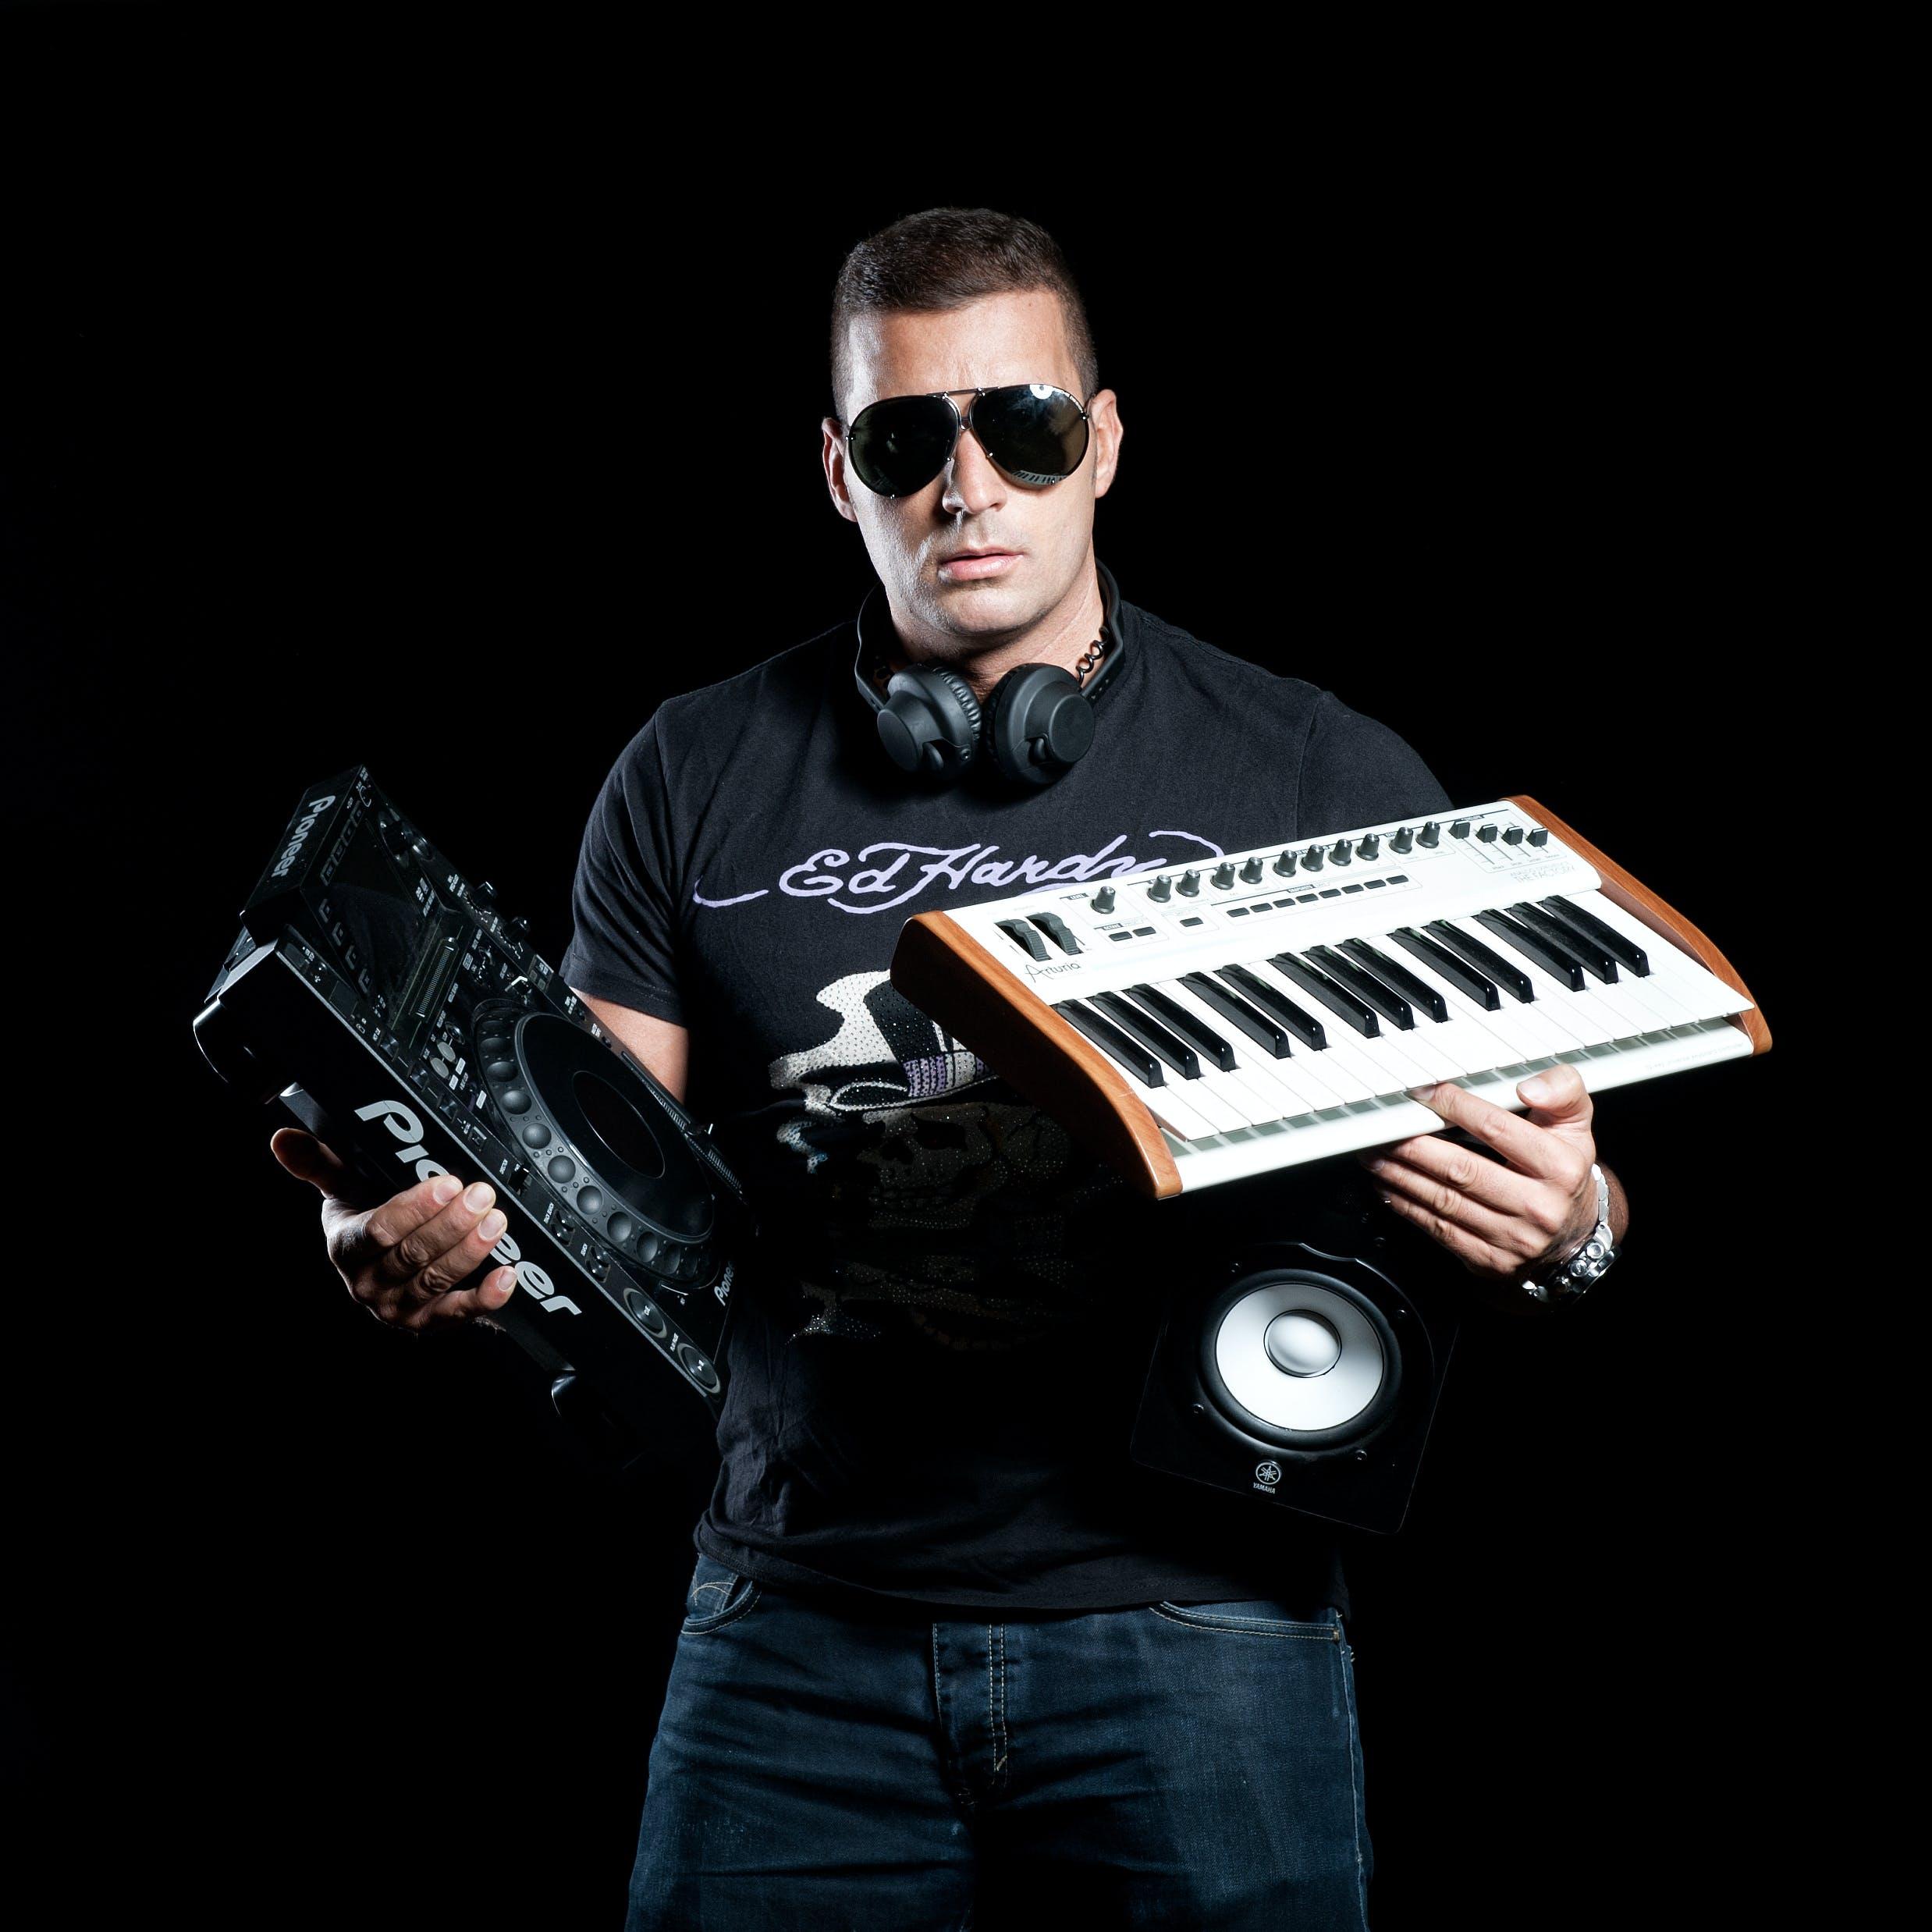 Free stock photo of dj, producer, remixer